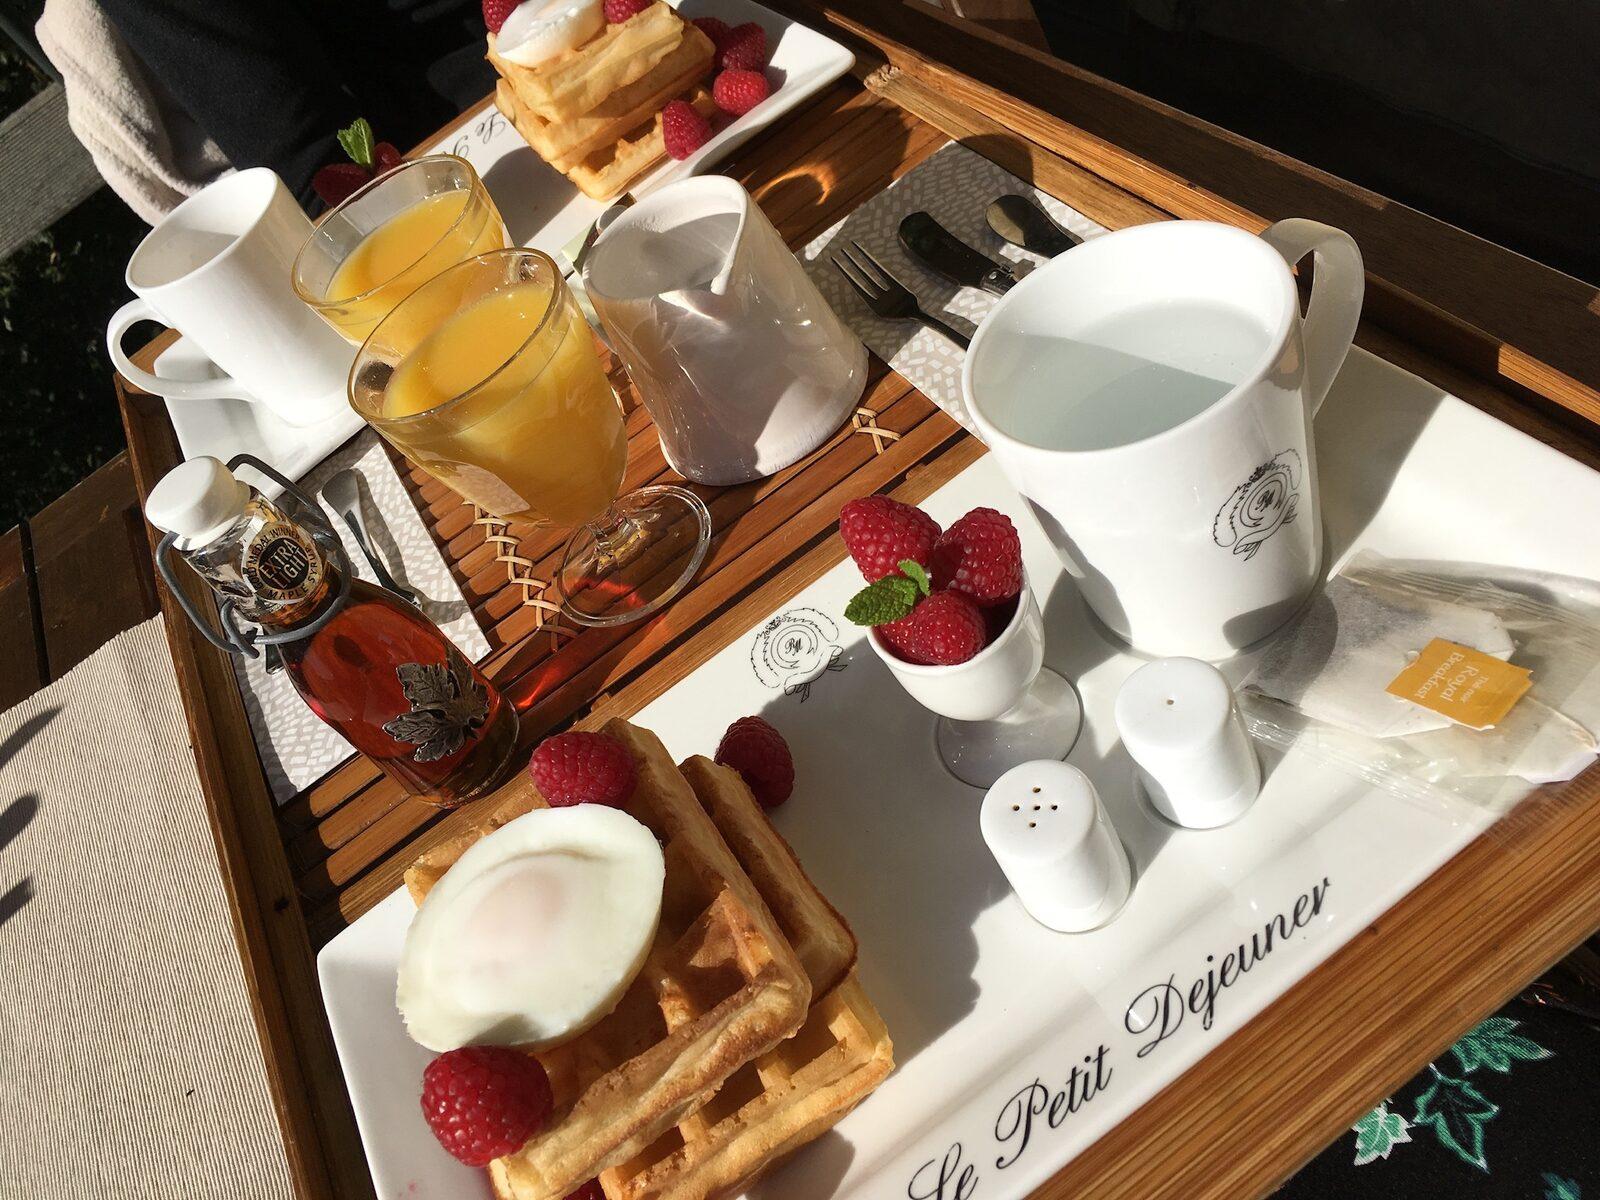 Ontbijt bij le Paradis, glamping in Zuid-Frankrijk